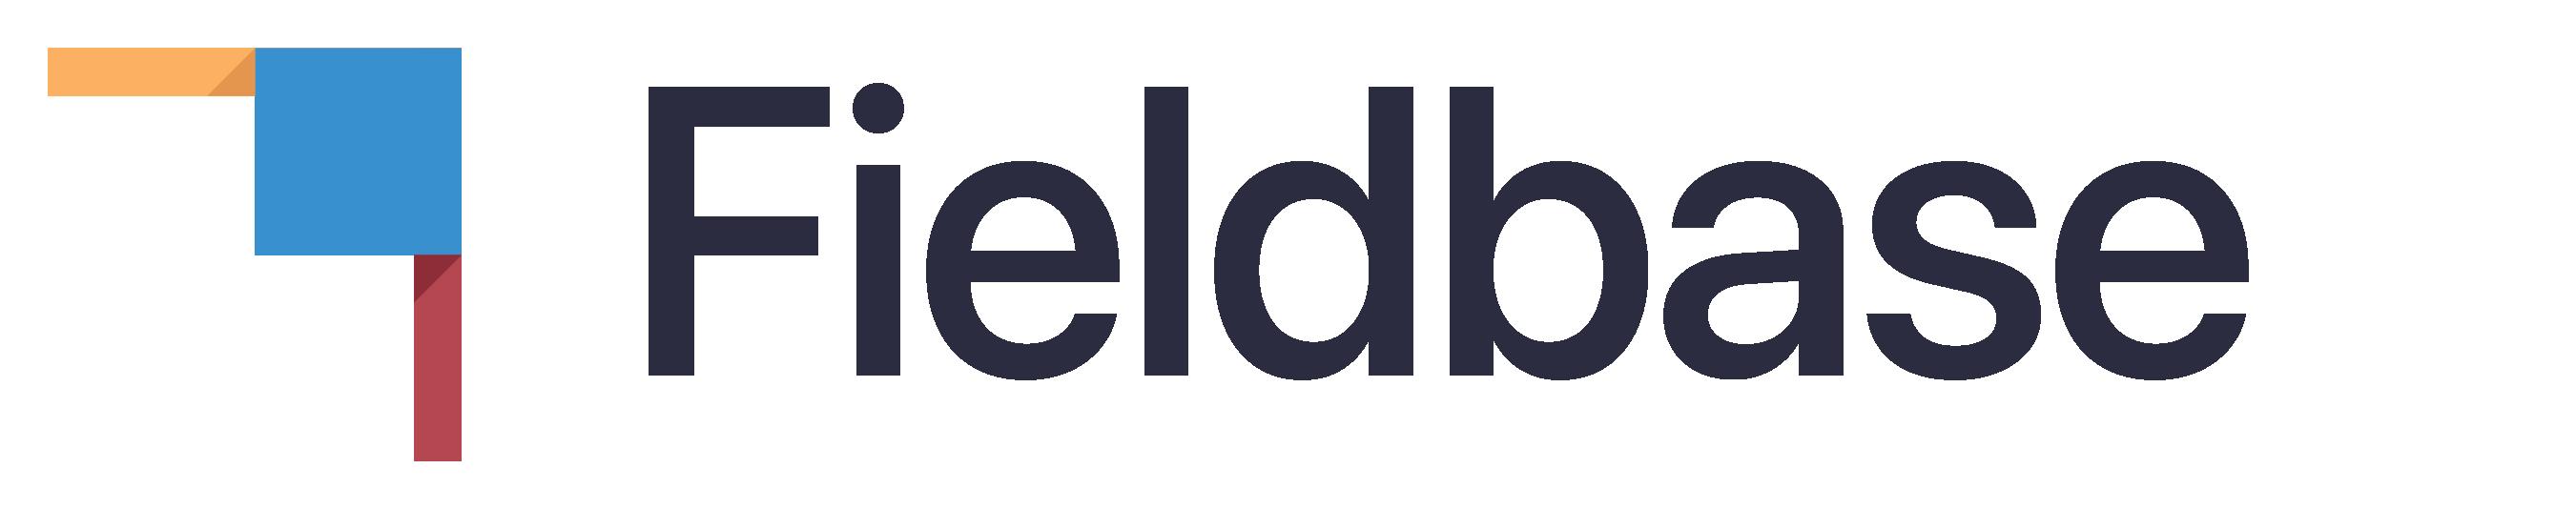 Fieldbase logo